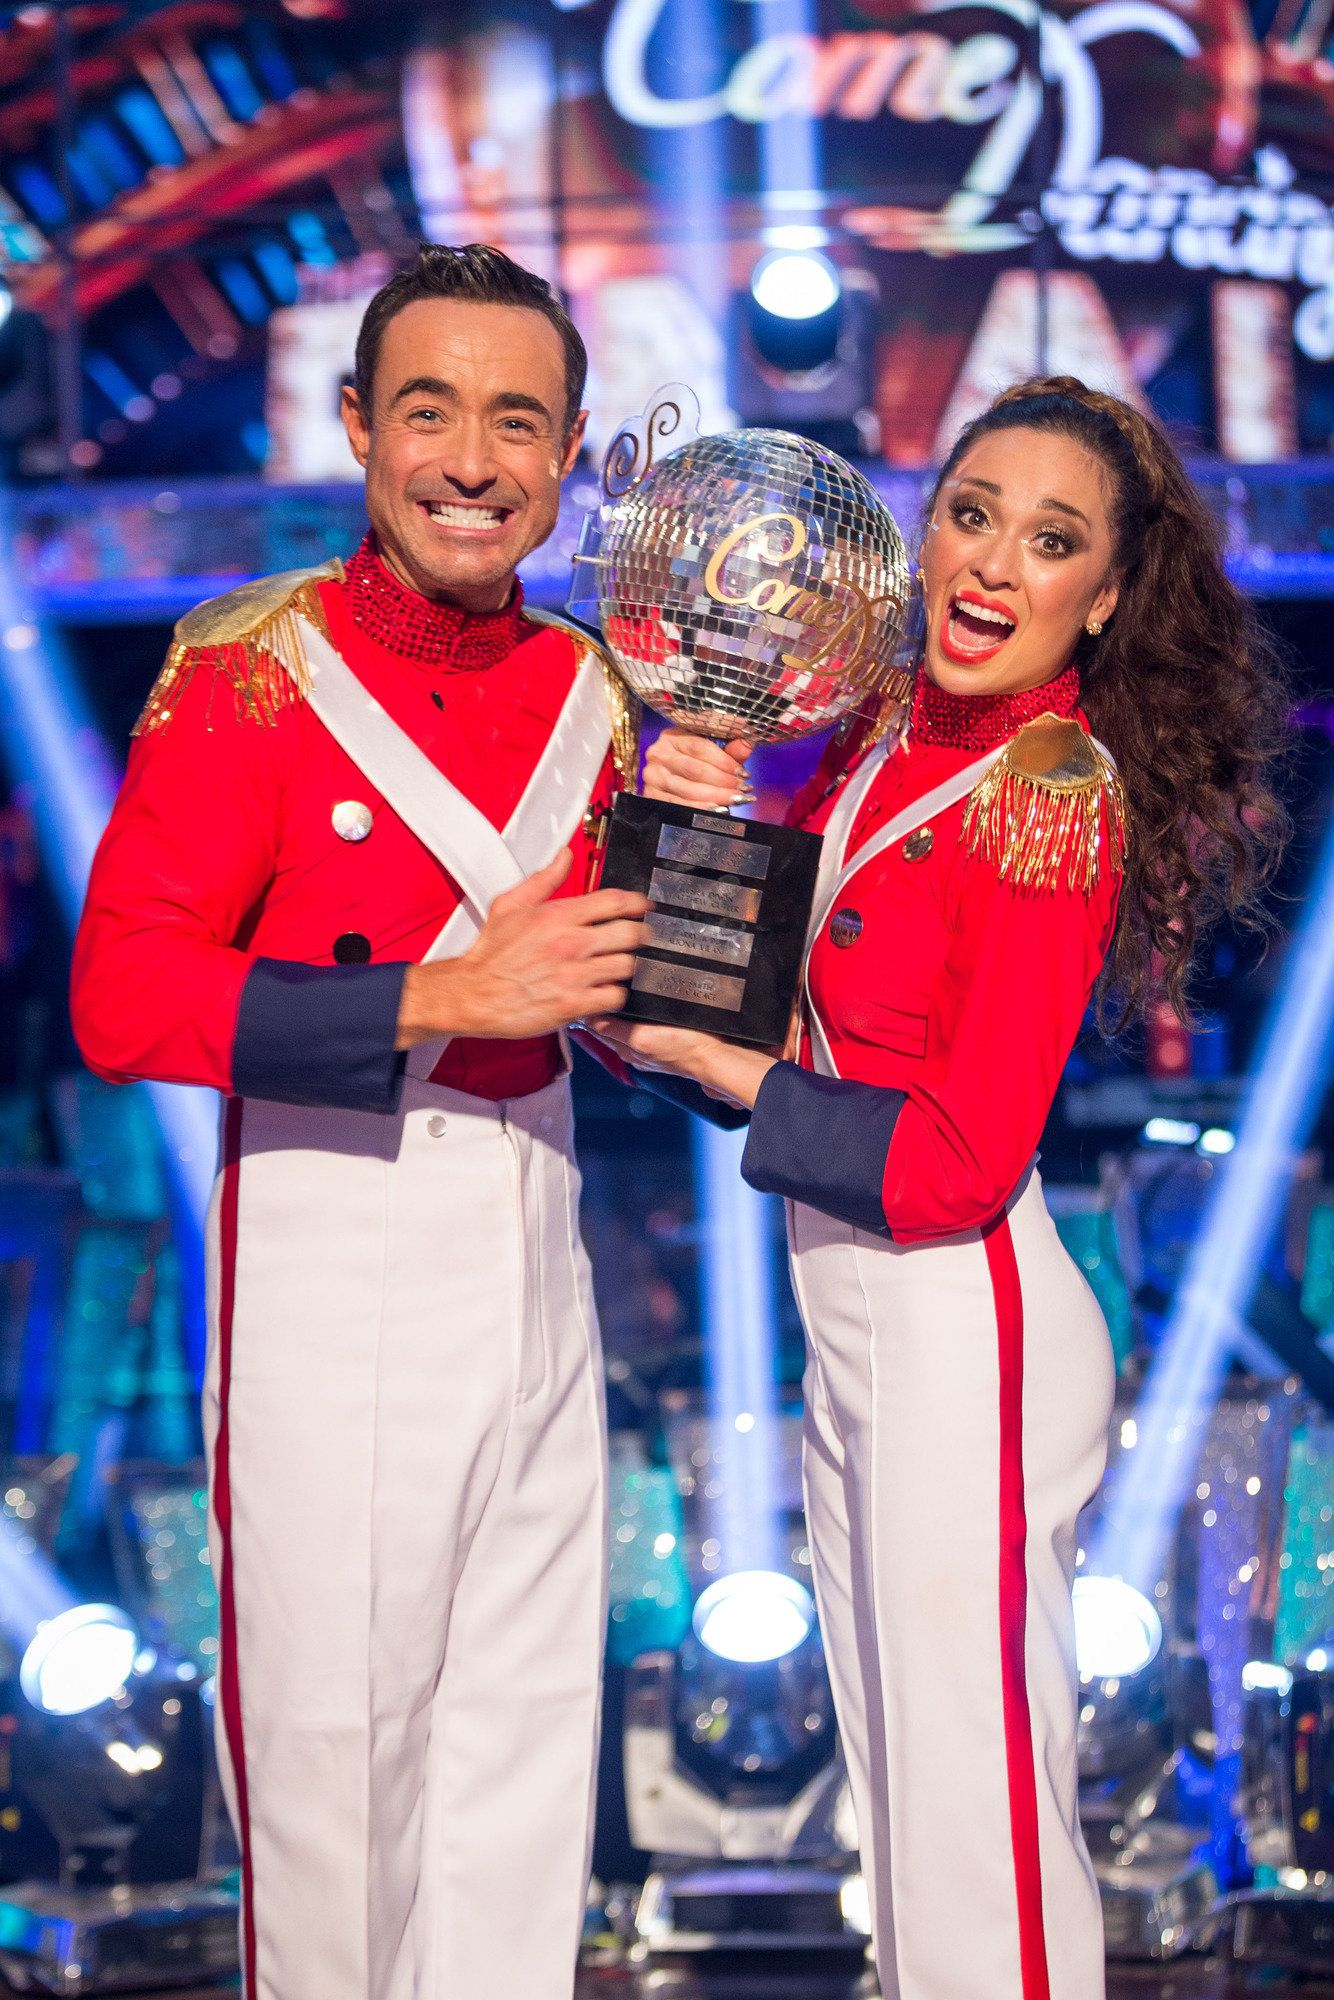 Joe McFadden and Katya Jones were crowned winners of 'Strictly Come Dancing'